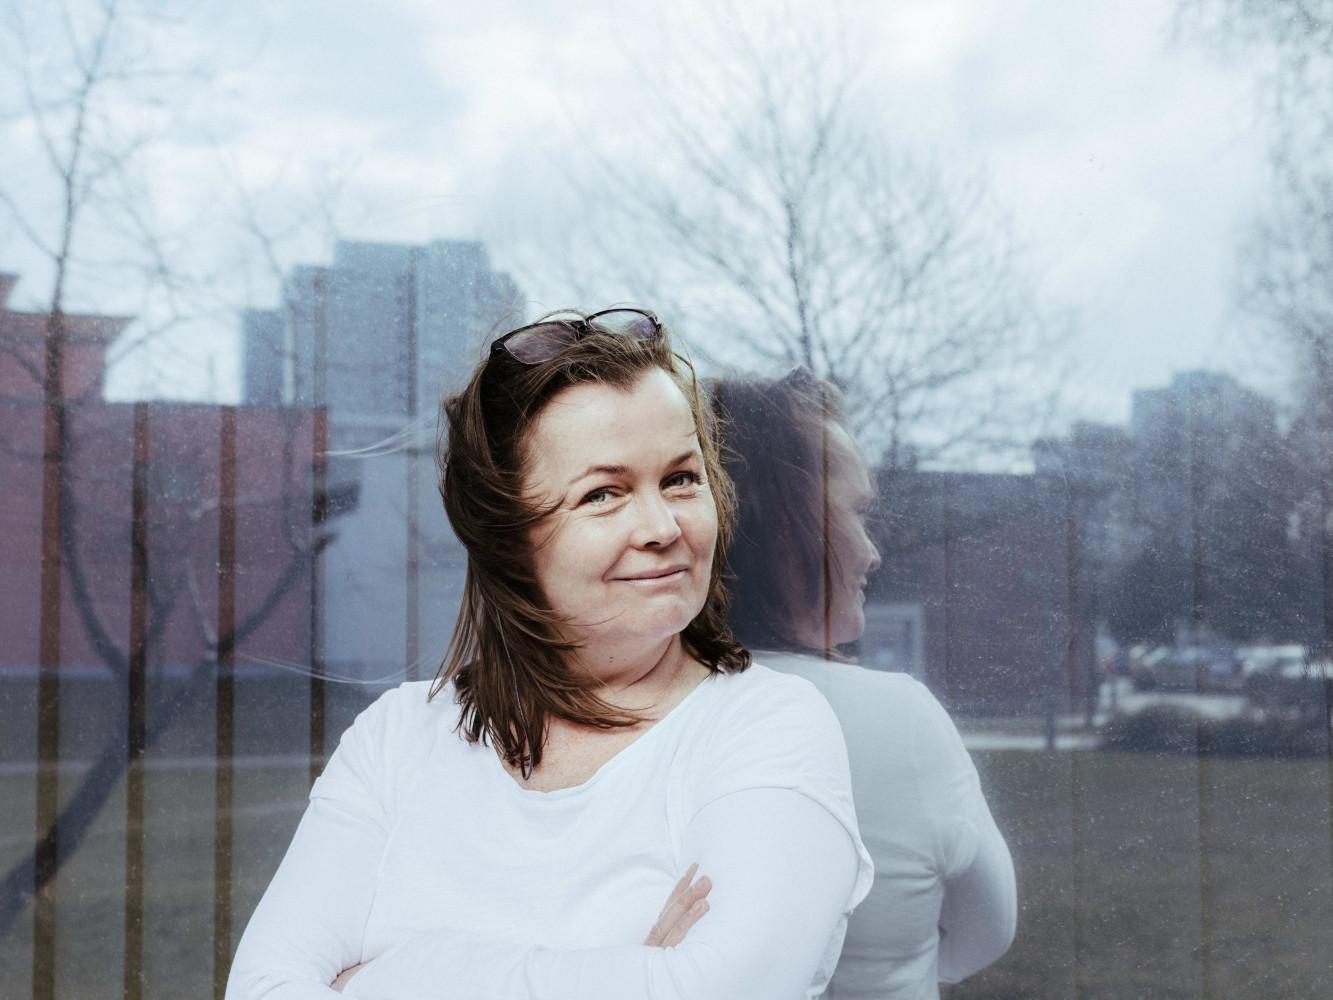 Oskamp Katja (c)  Paula Winkler.jpg